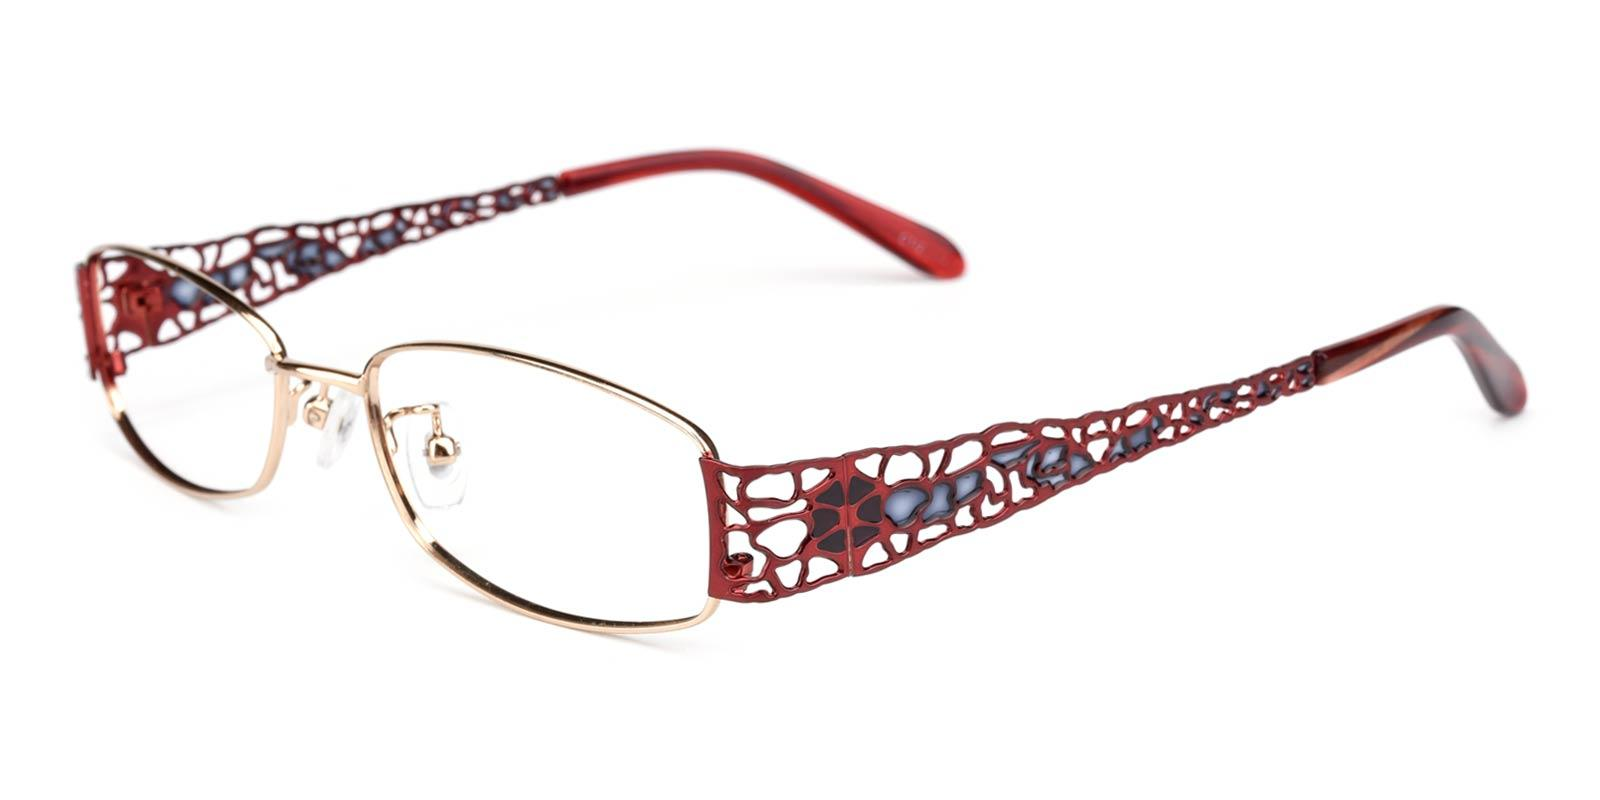 Spider-Red-Rectangle-Metal-Eyeglasses-detail